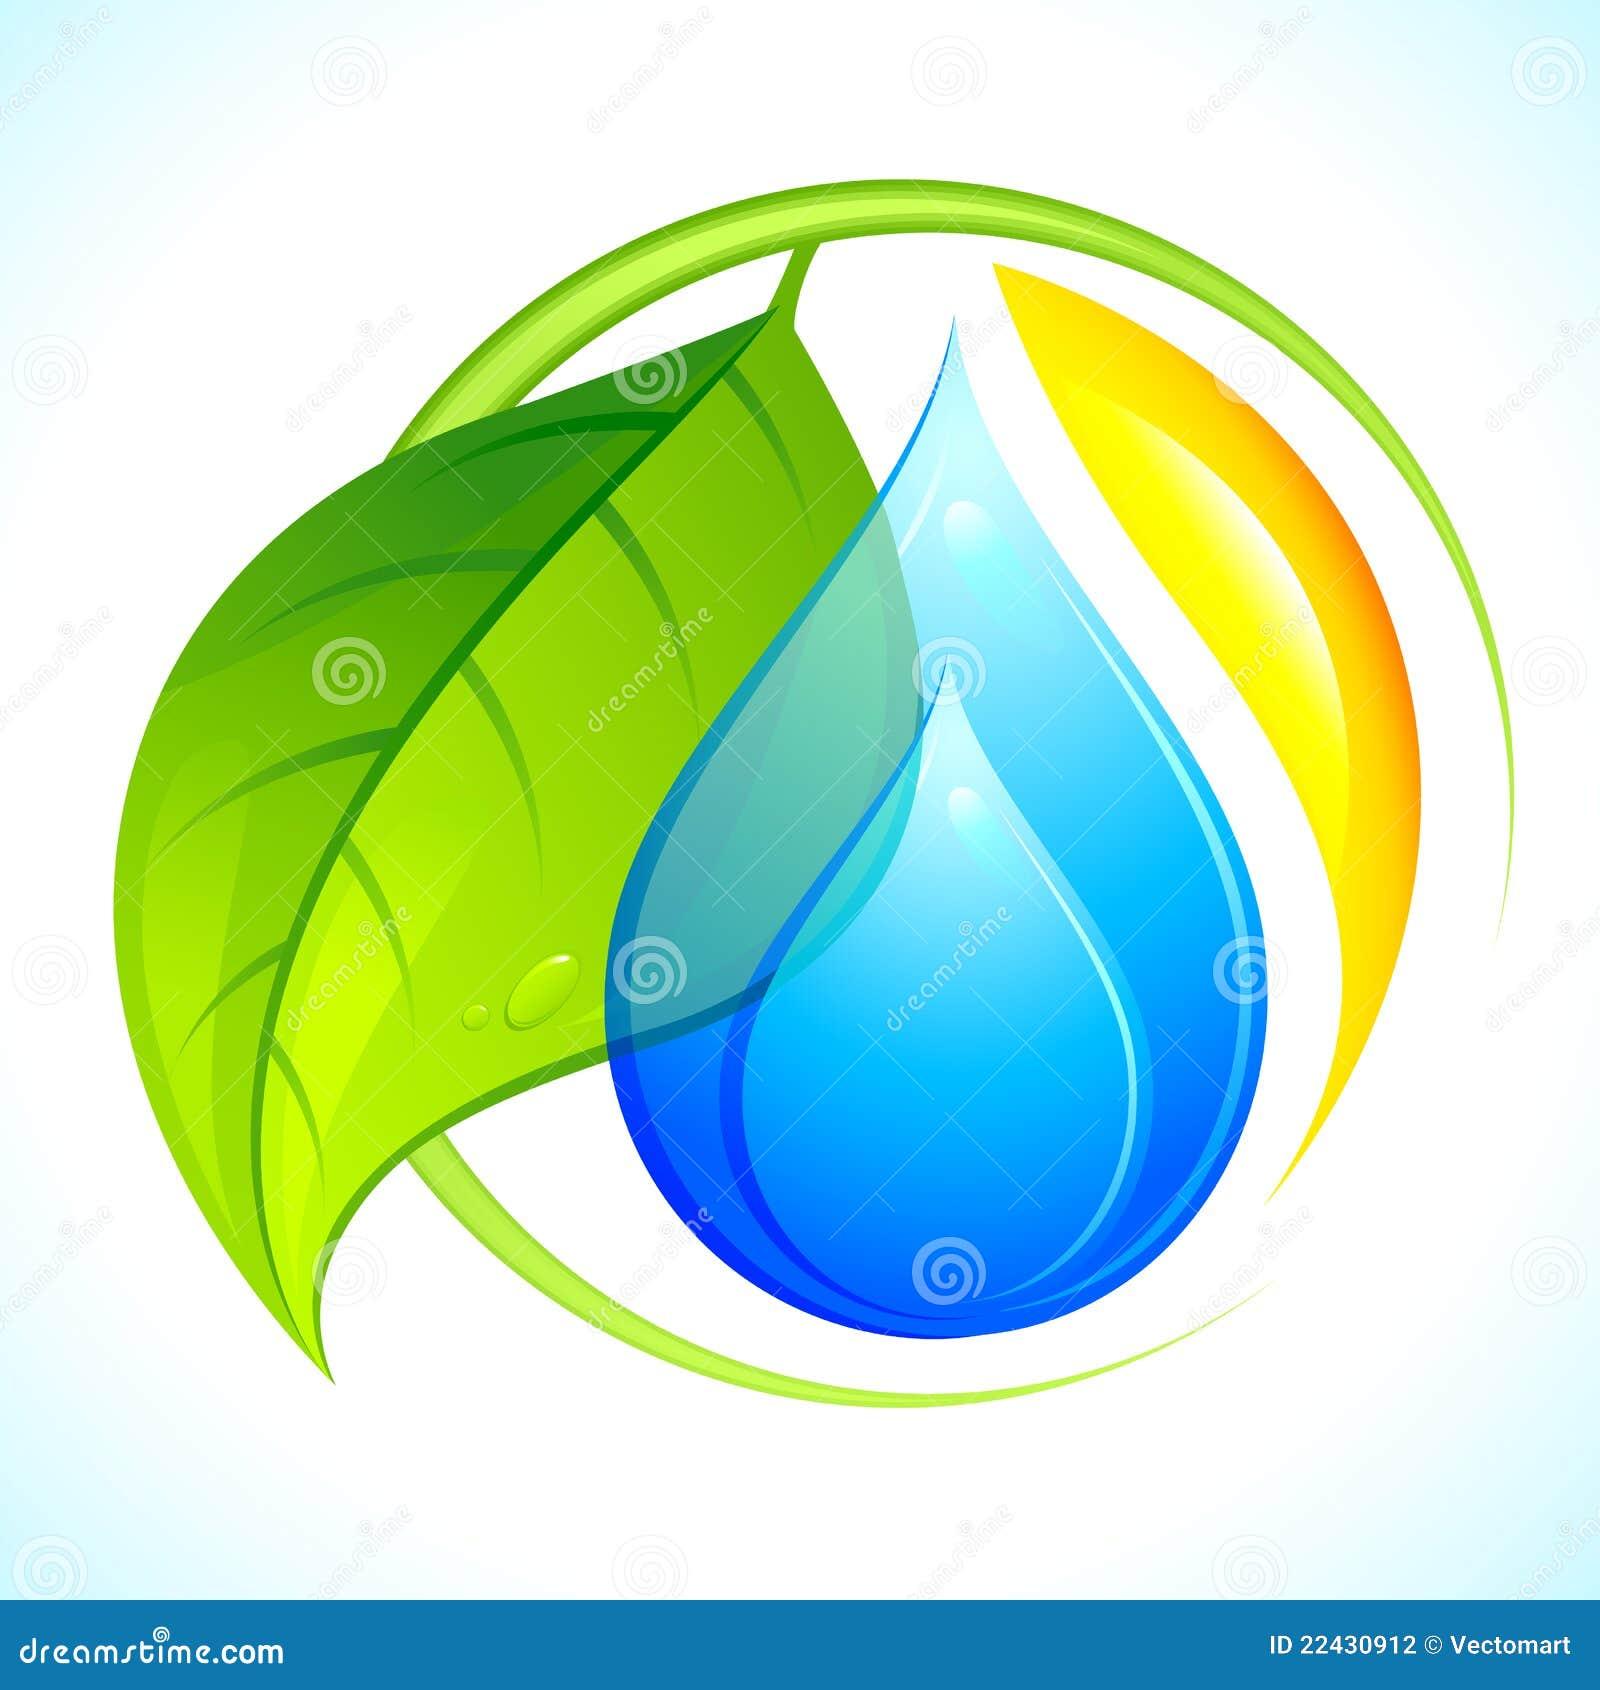 The Vapor Pressure of Liquid Water That Has